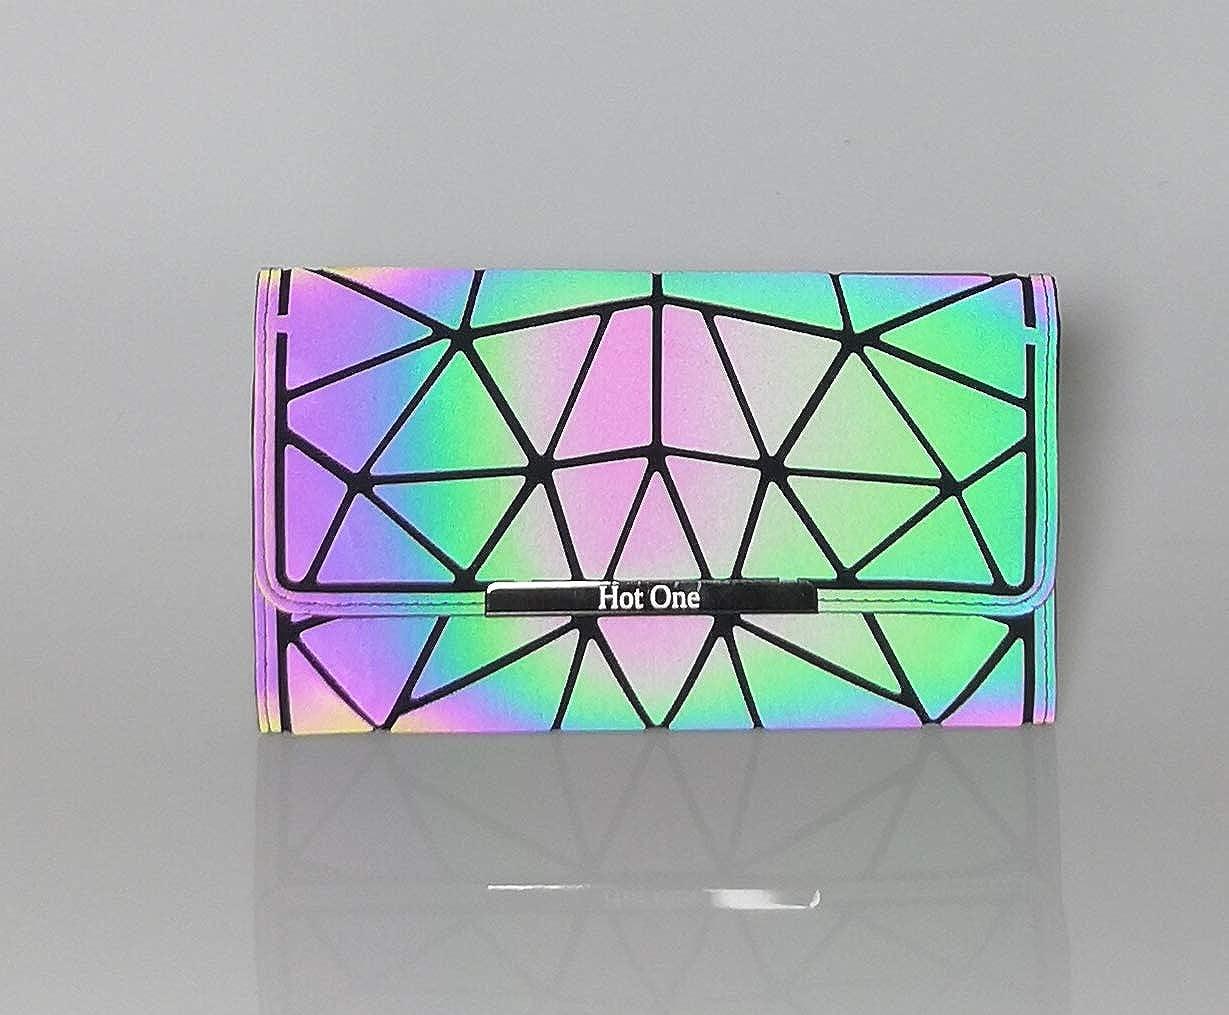 HotOne Geometric Purse Holographic Purse and Handbag Color Changes Luminous Purse for Women